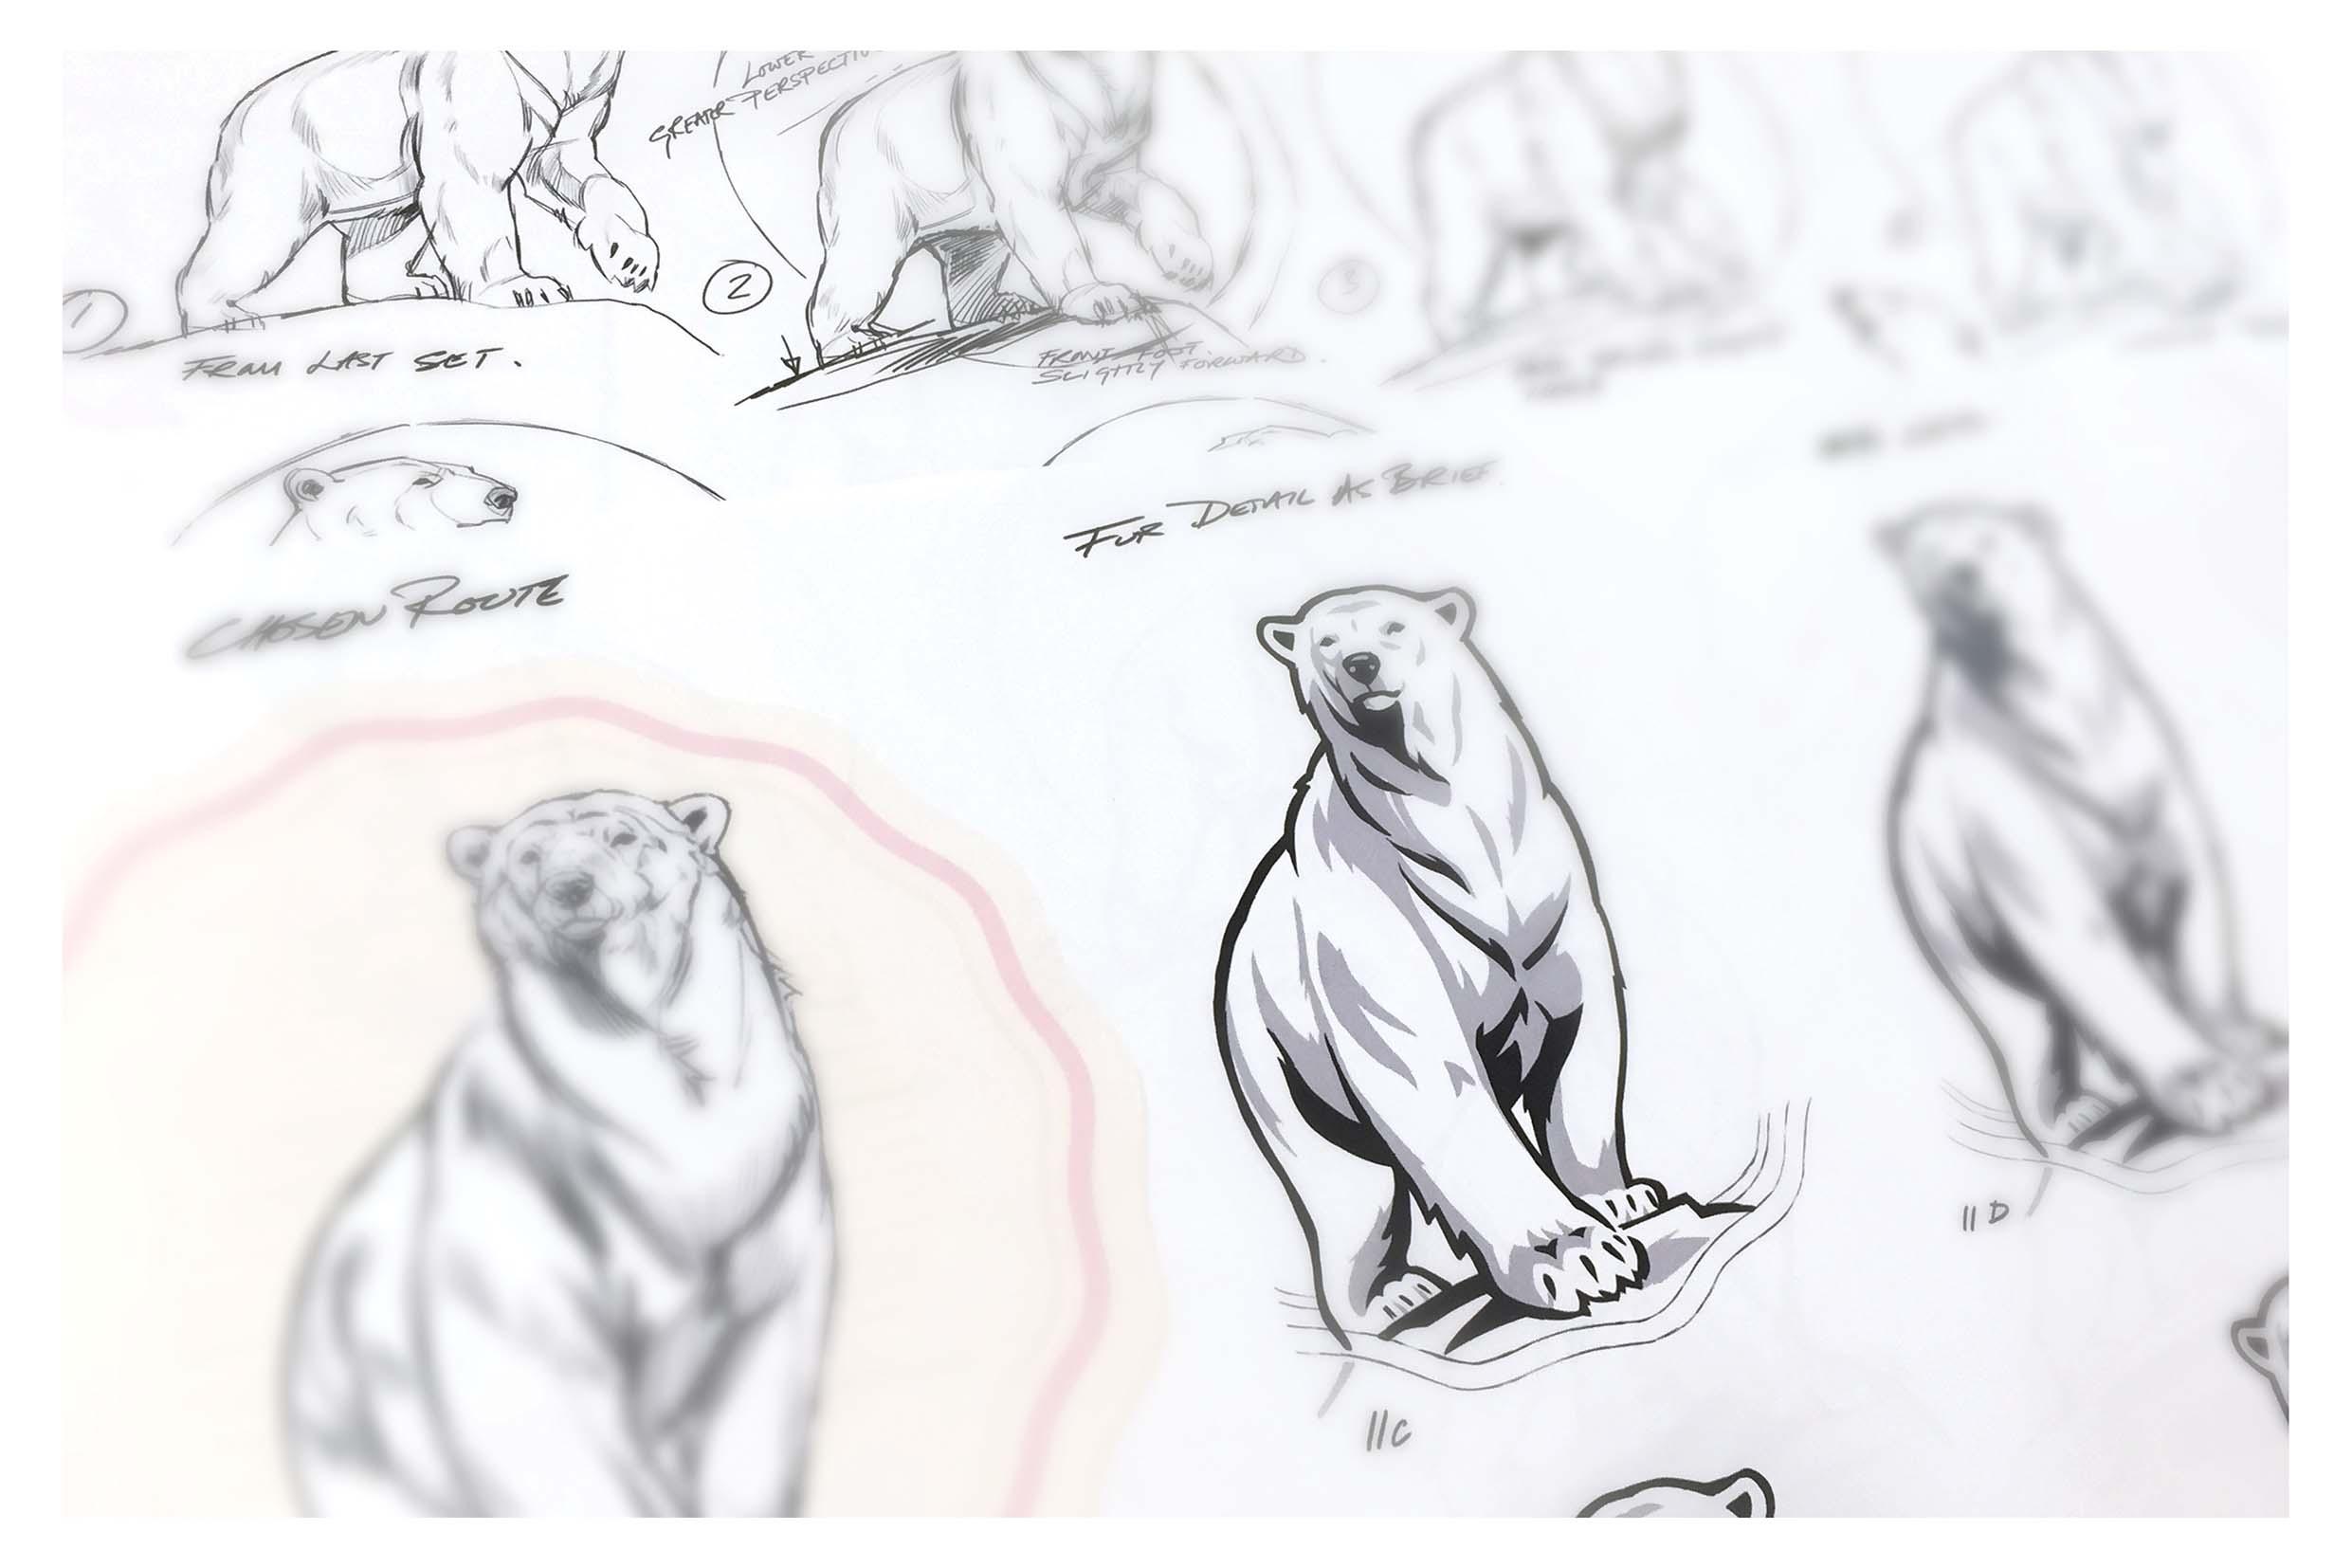 Diageo_BUNDY_Layouts_Sketches_150dpi_RGB.jpg